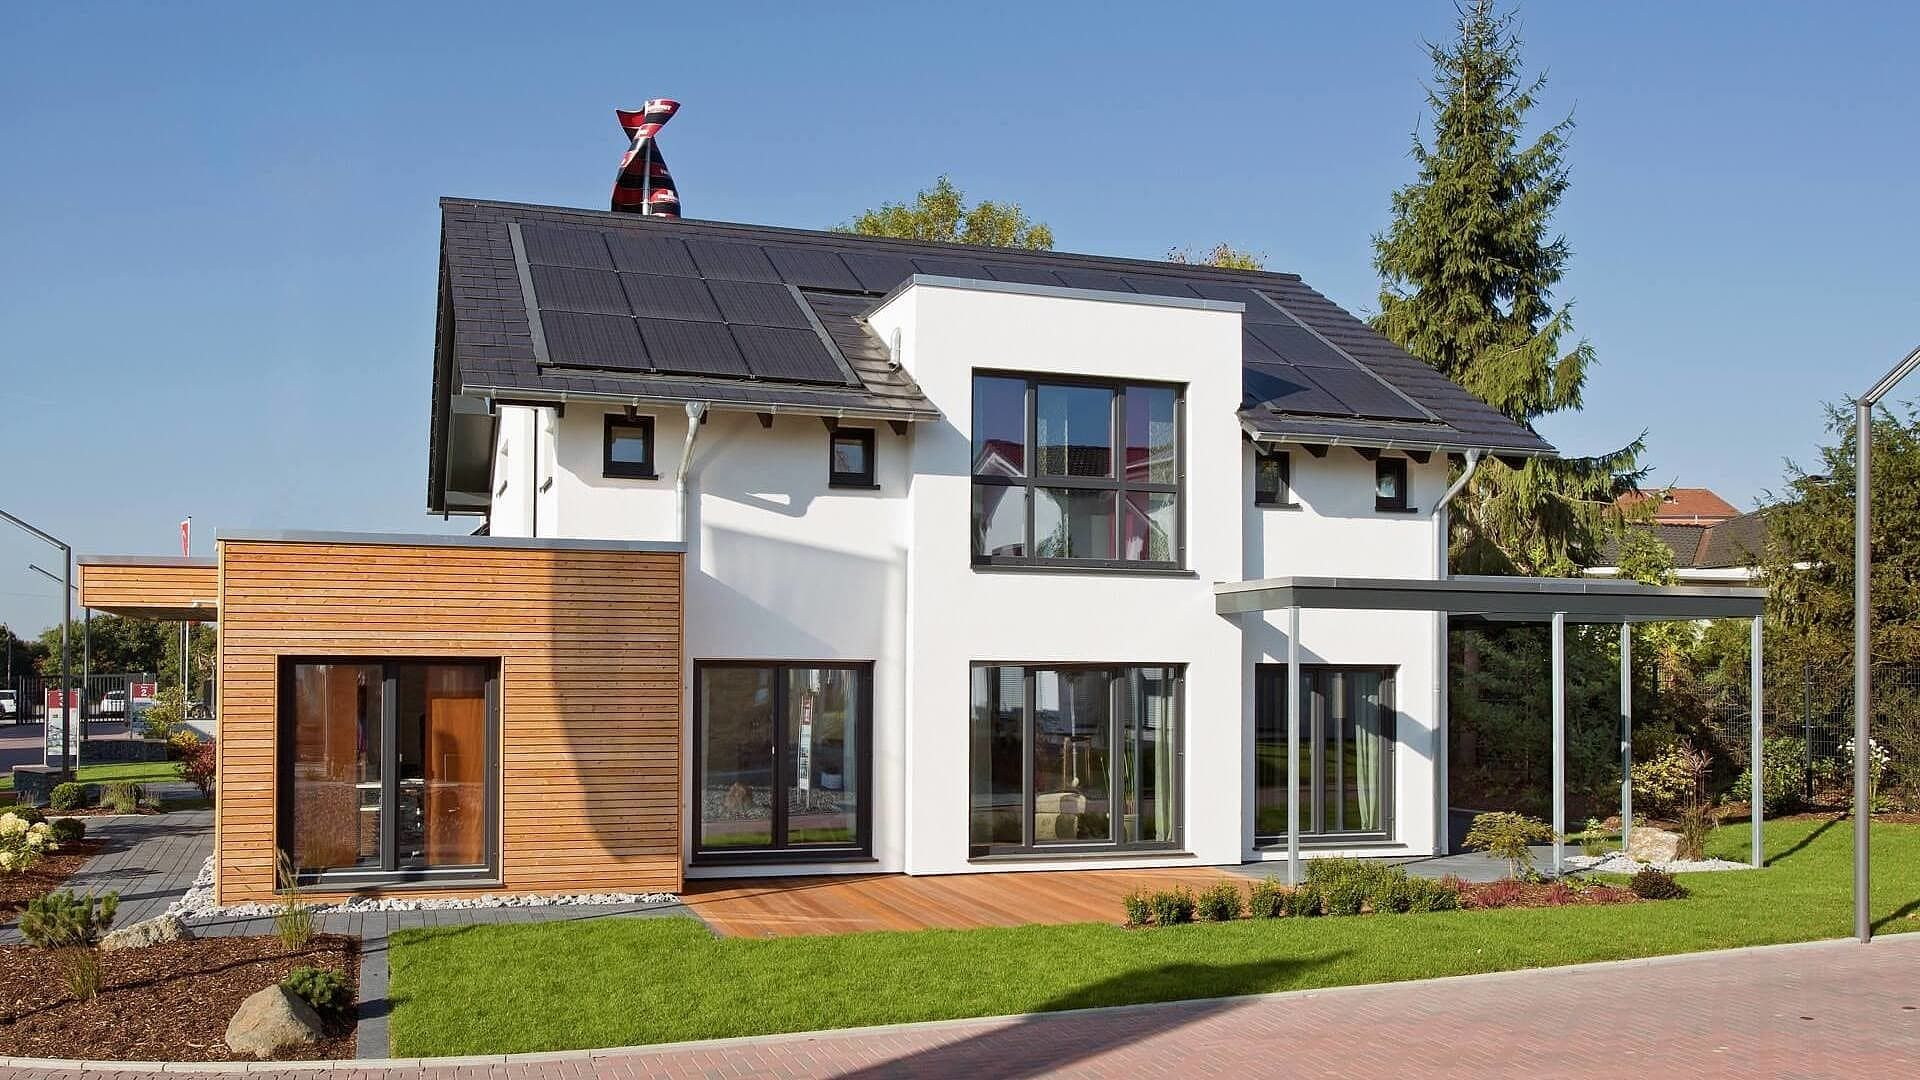 Musterhaus Wuppertal Fingerhut Haus Haus Haus Bauen